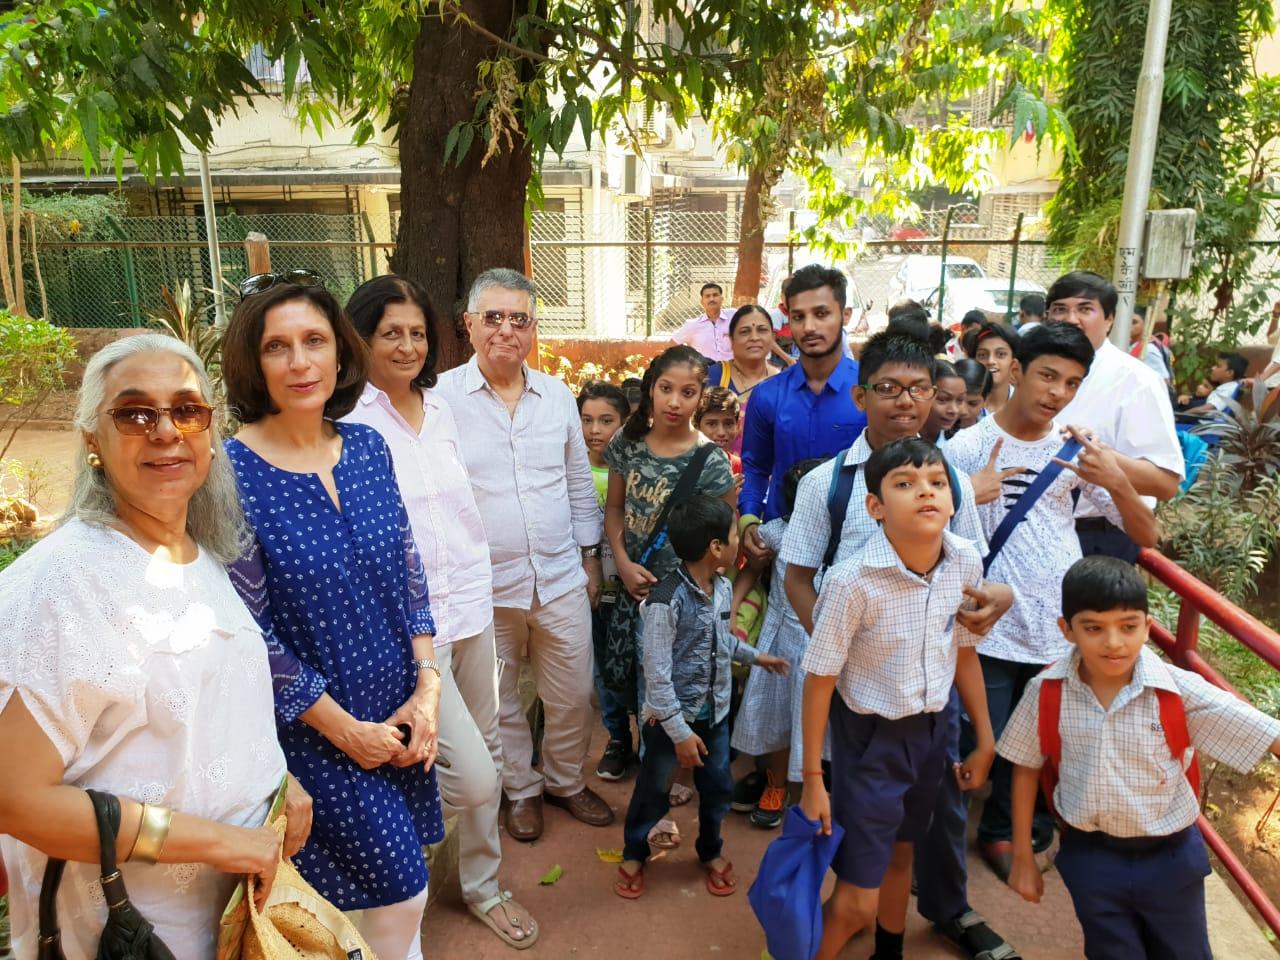 Nov 2018 Annual School Picnic Members of the Inner Wheel Club of Bombay who sponsored the picnic